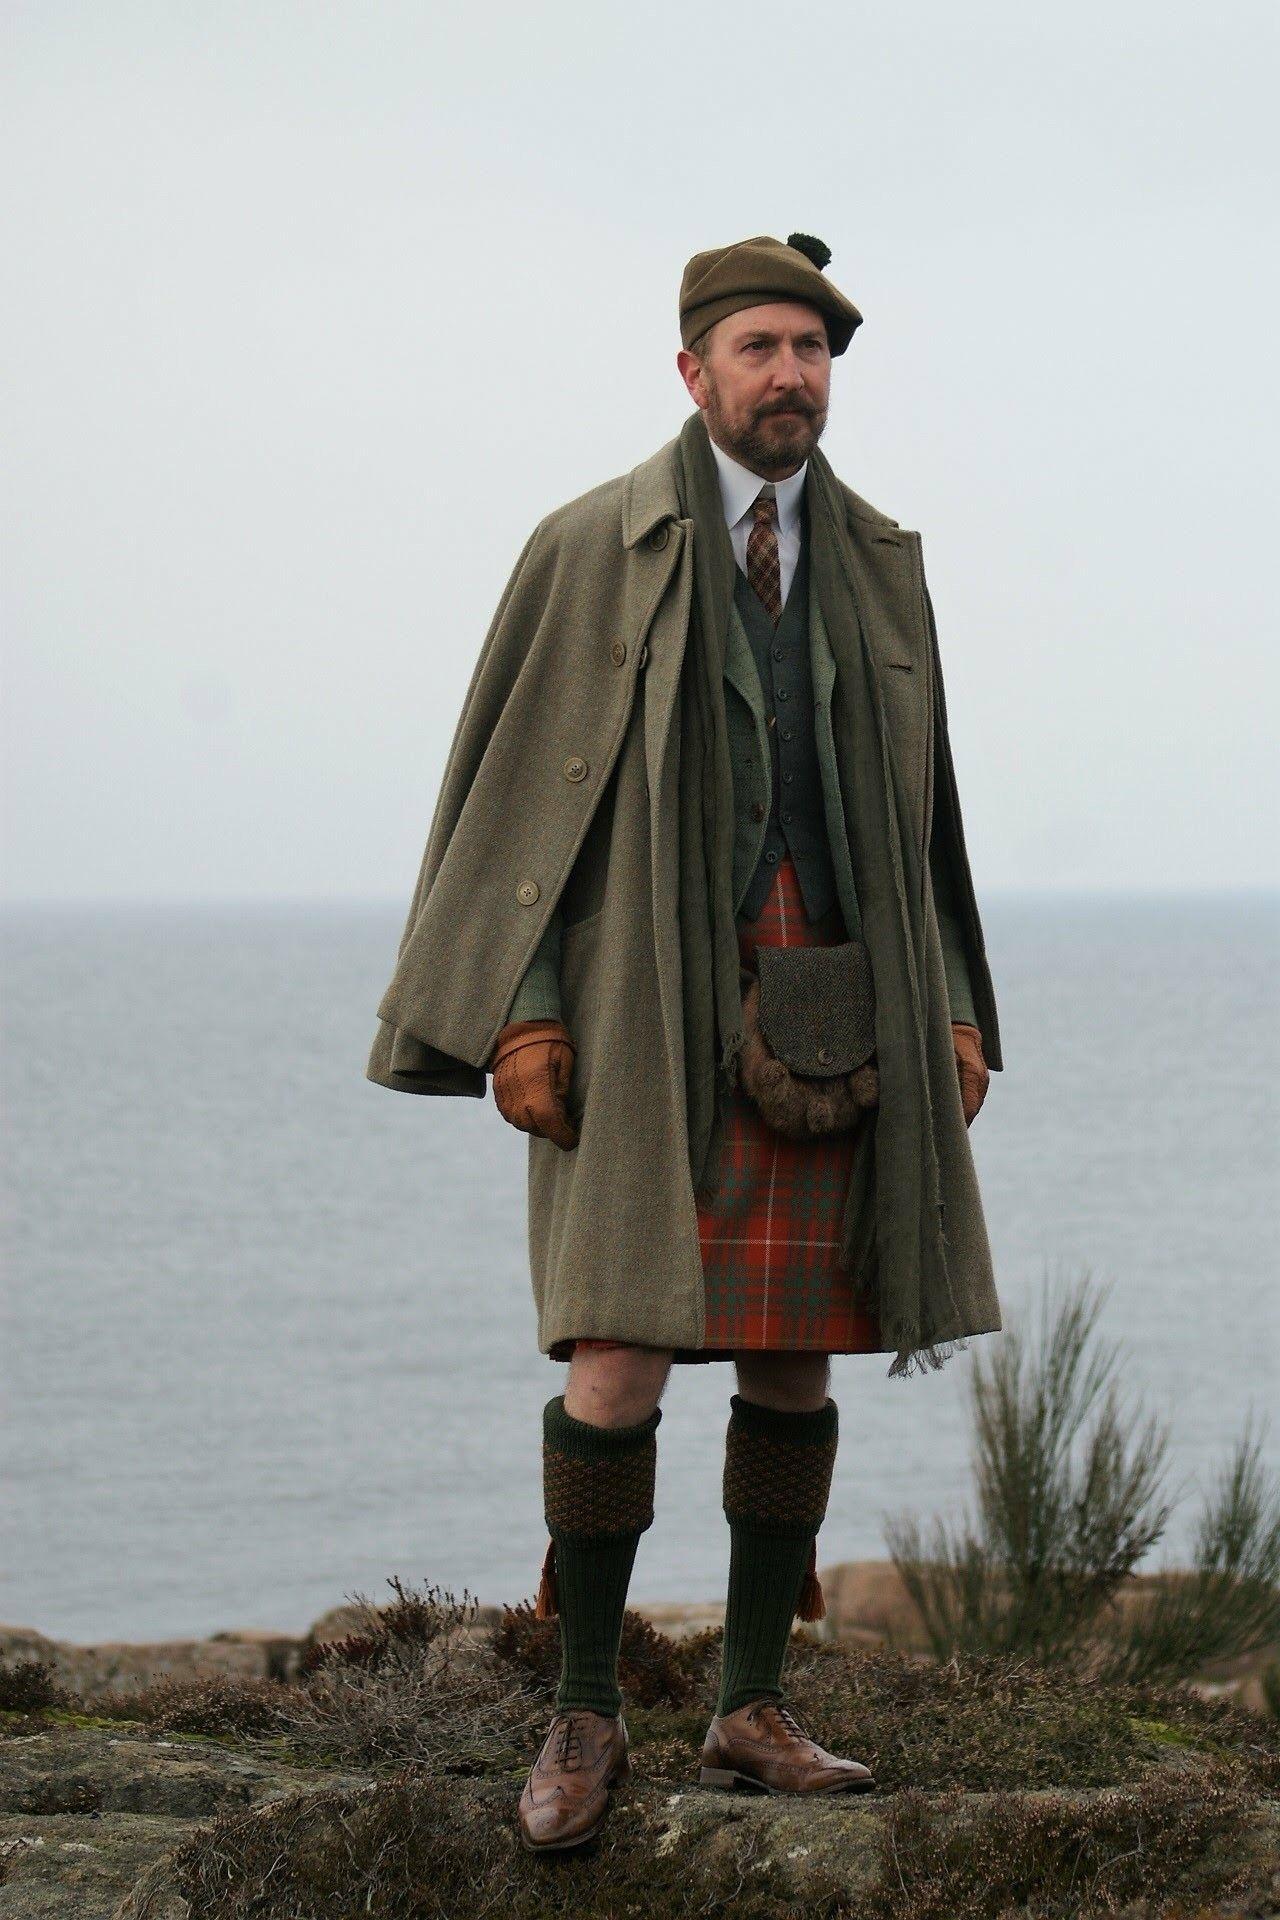 Kilt and Inverness Cape.. Bornholm 7e54aa1093c